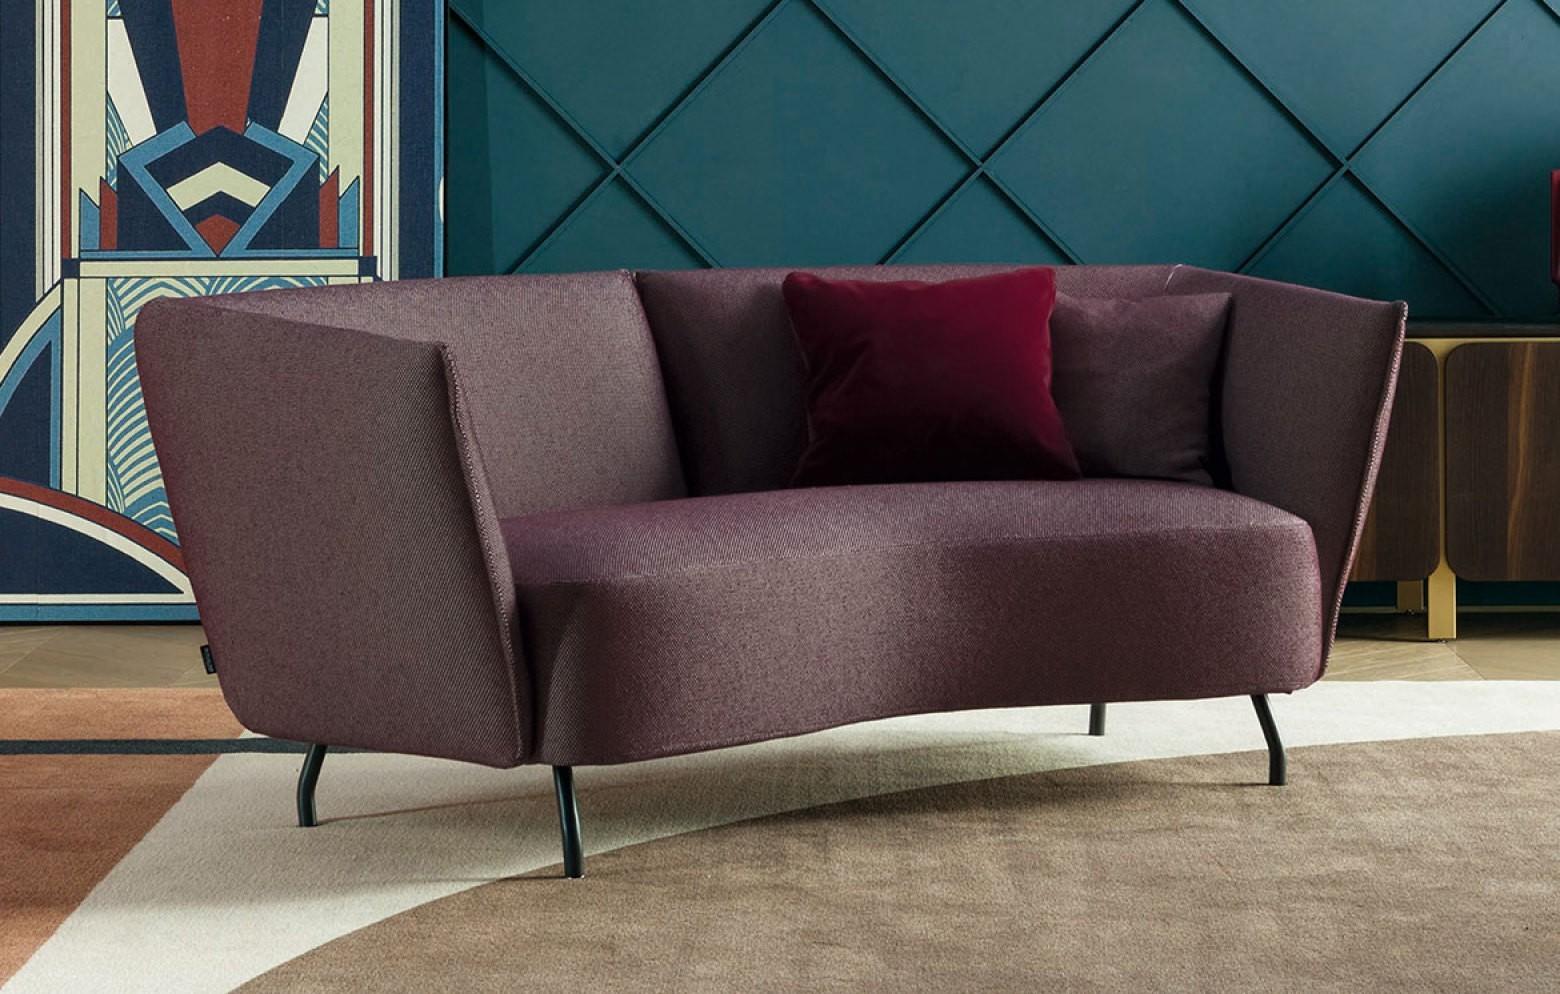 arno einzelsofa einzelsofas polsterm bel who 39 s perfect. Black Bedroom Furniture Sets. Home Design Ideas